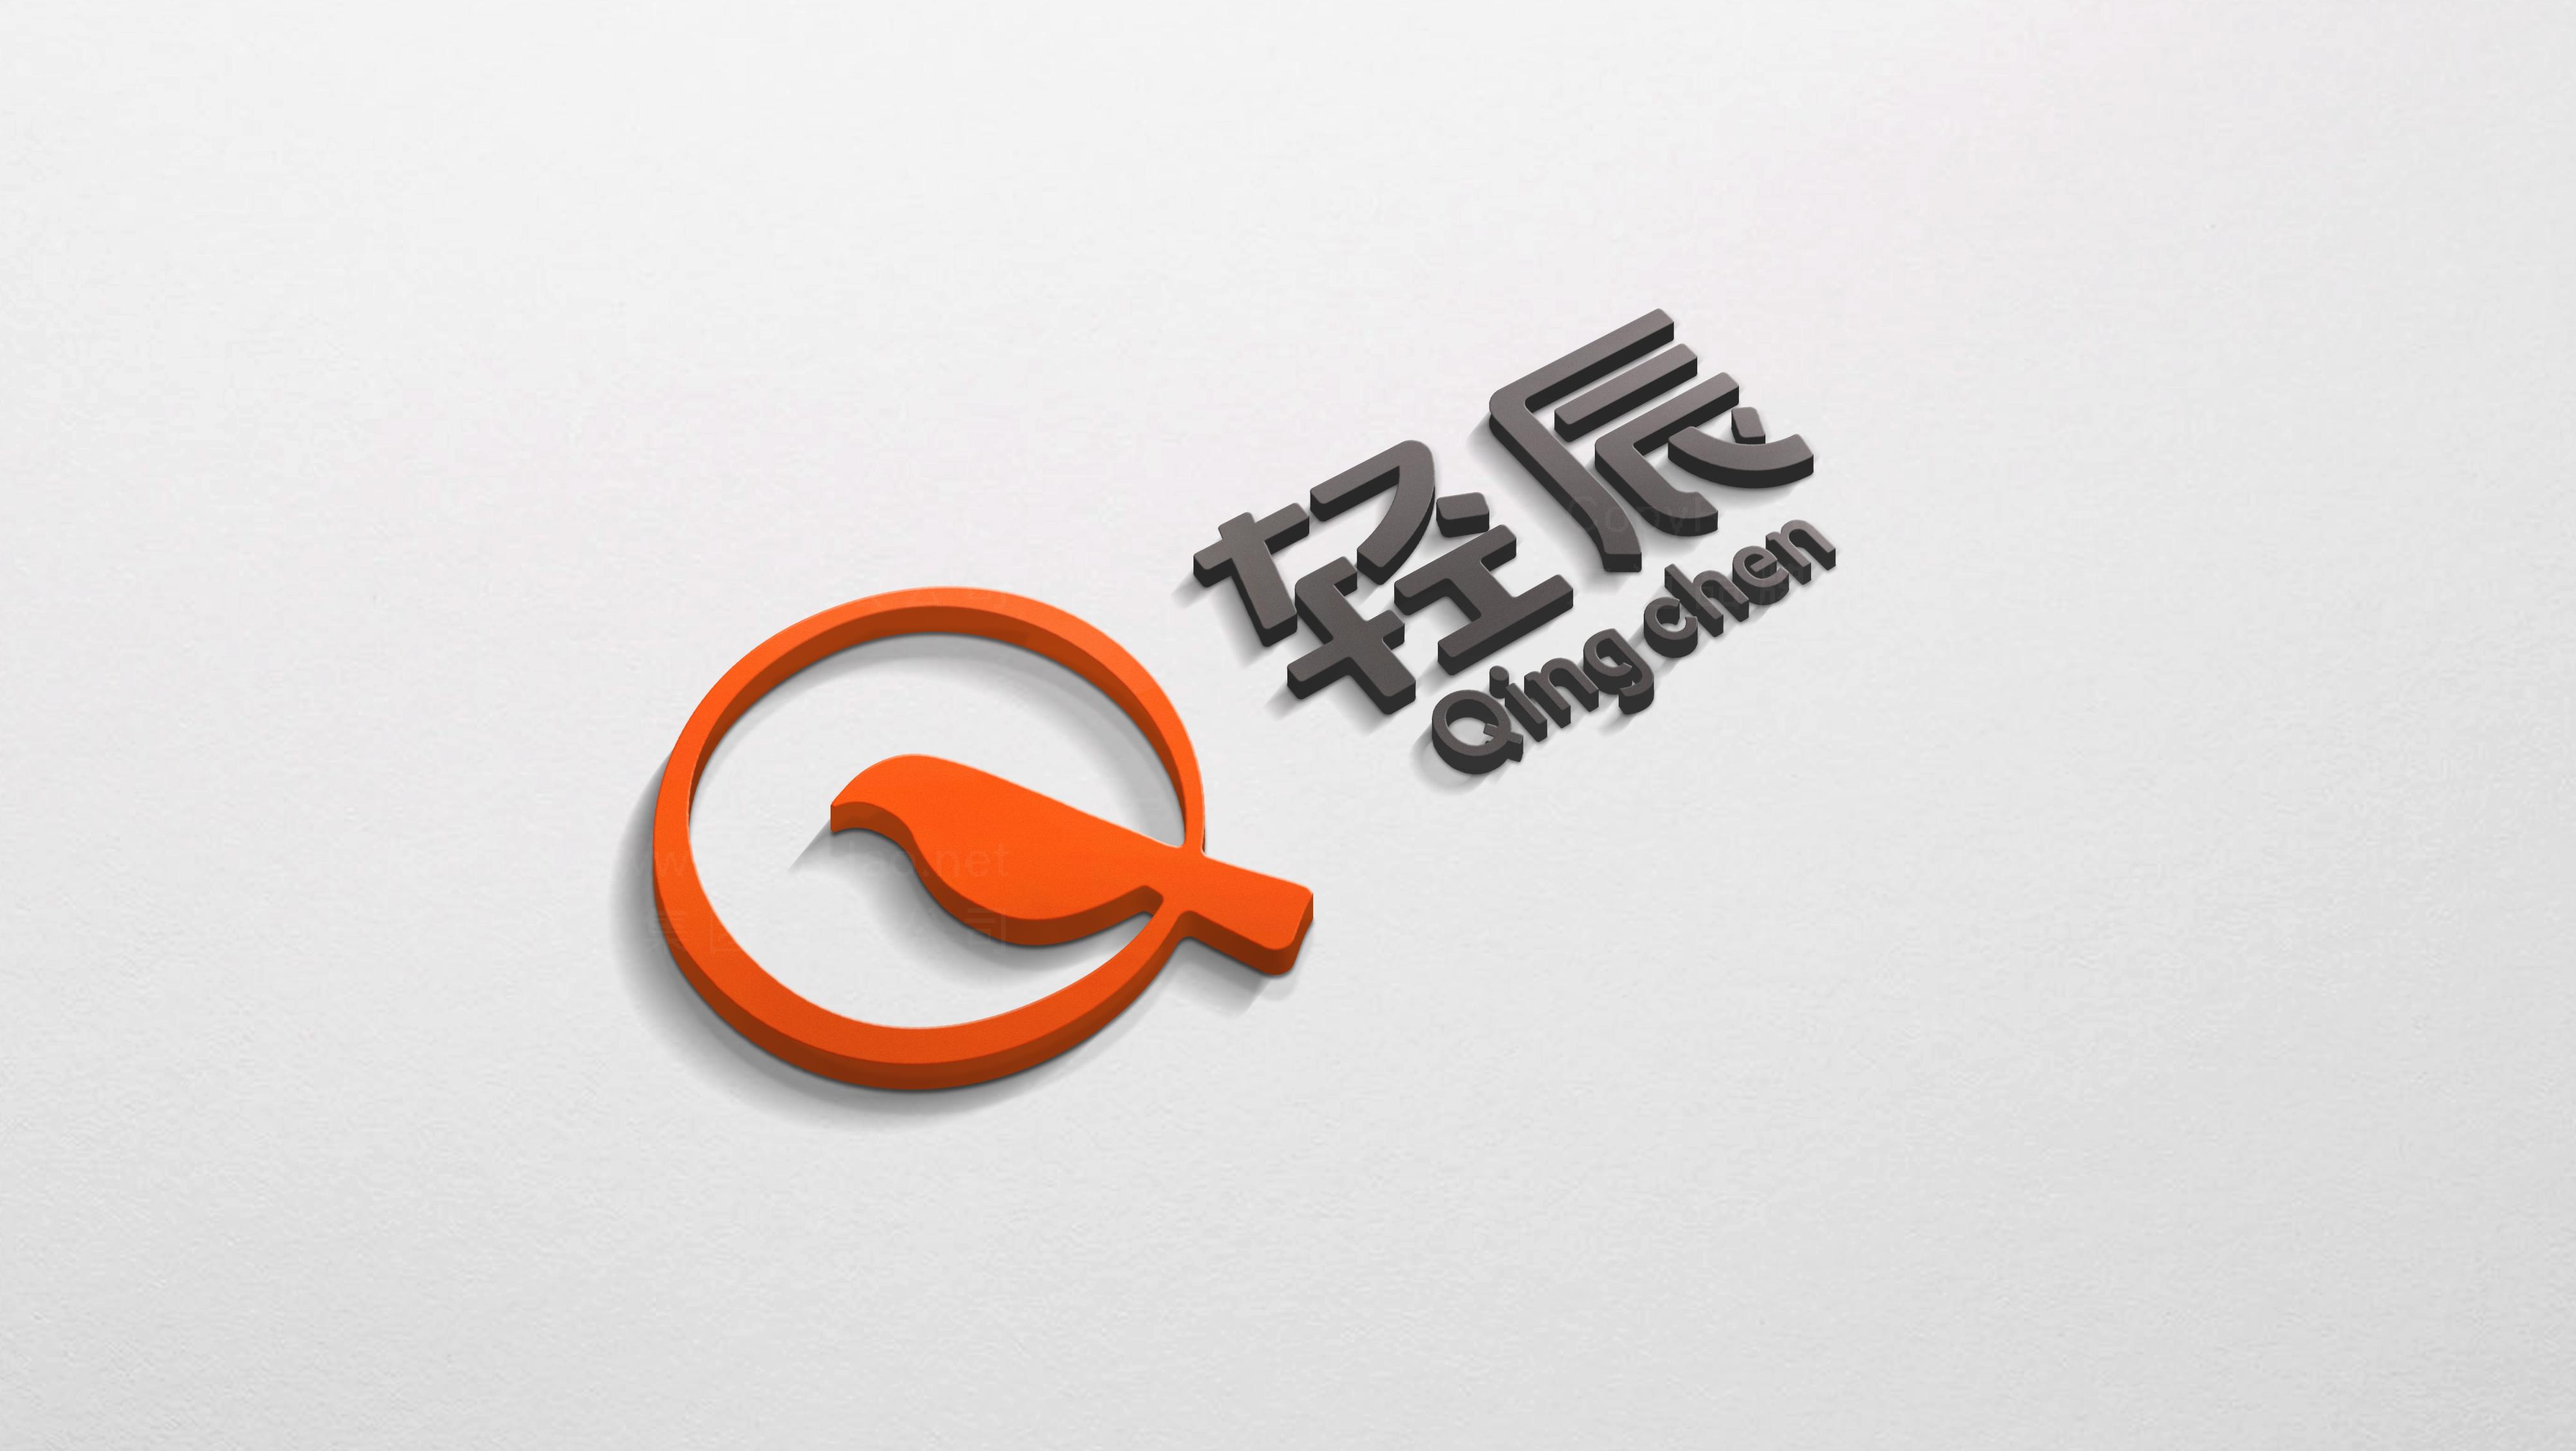 美食logo设计